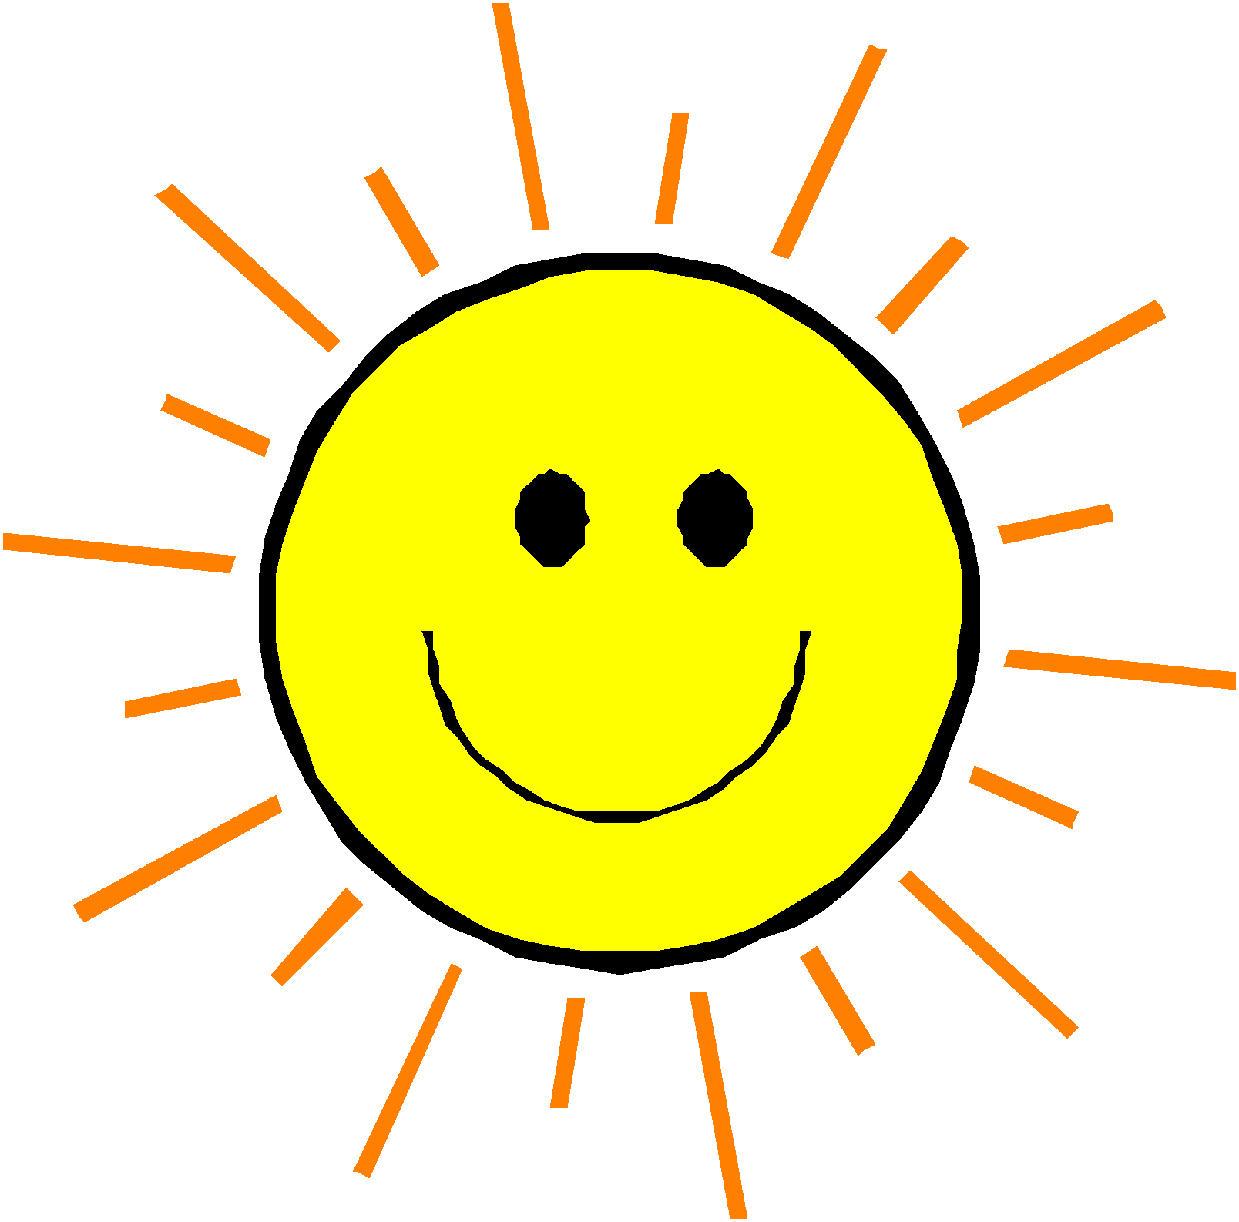 1239x1222 Sunshine Free Sun Clipart Public Domain Sun Clip Art Images And 4